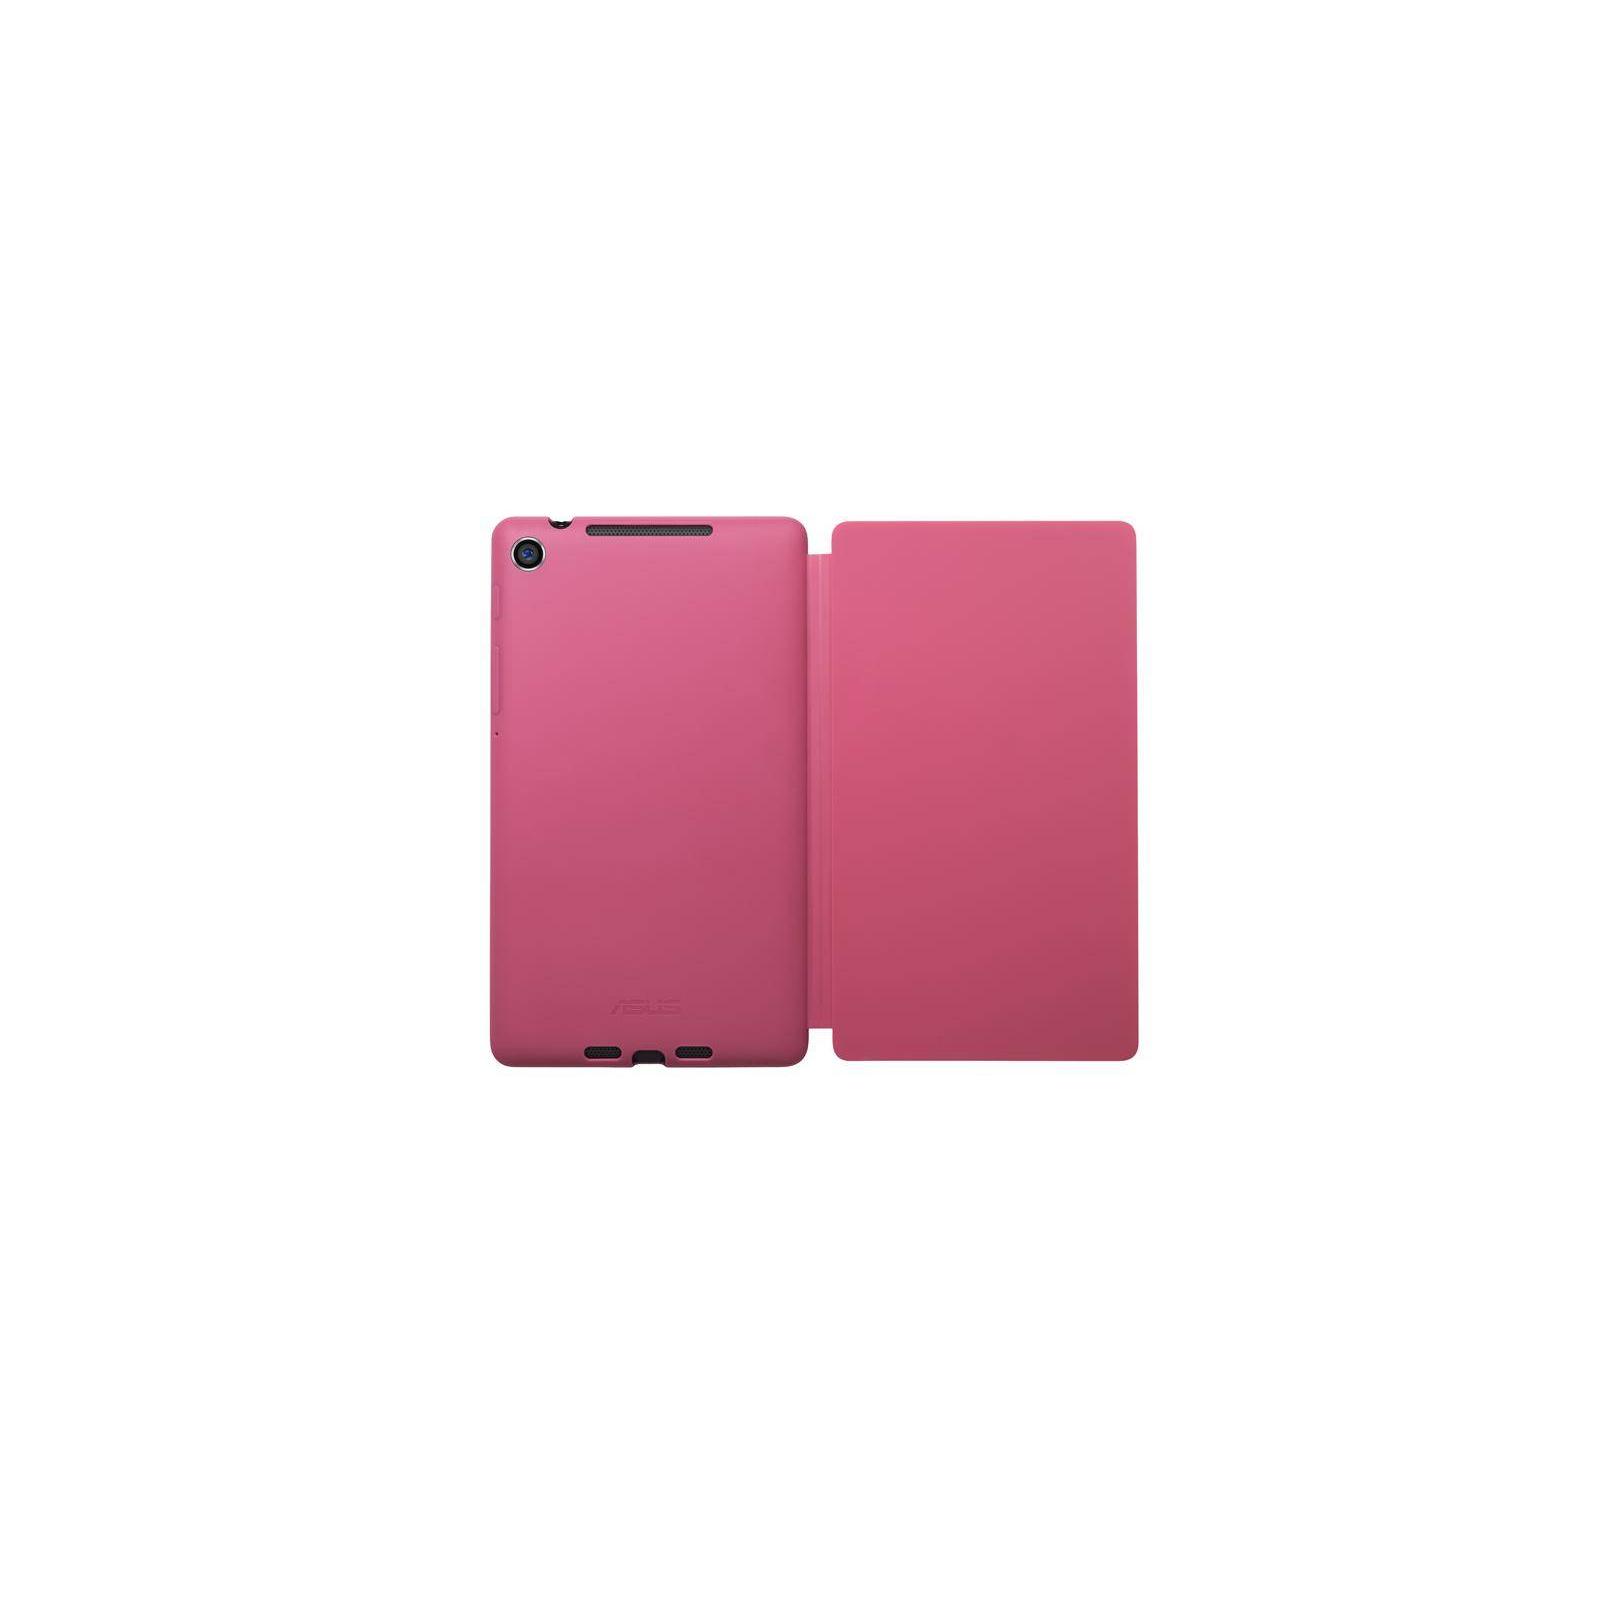 Чехол для планшета ASUS Nexus 7 2013 TRAVEL COVER V2 PINK (90-XB3TOKSL001P0-) изображение 4